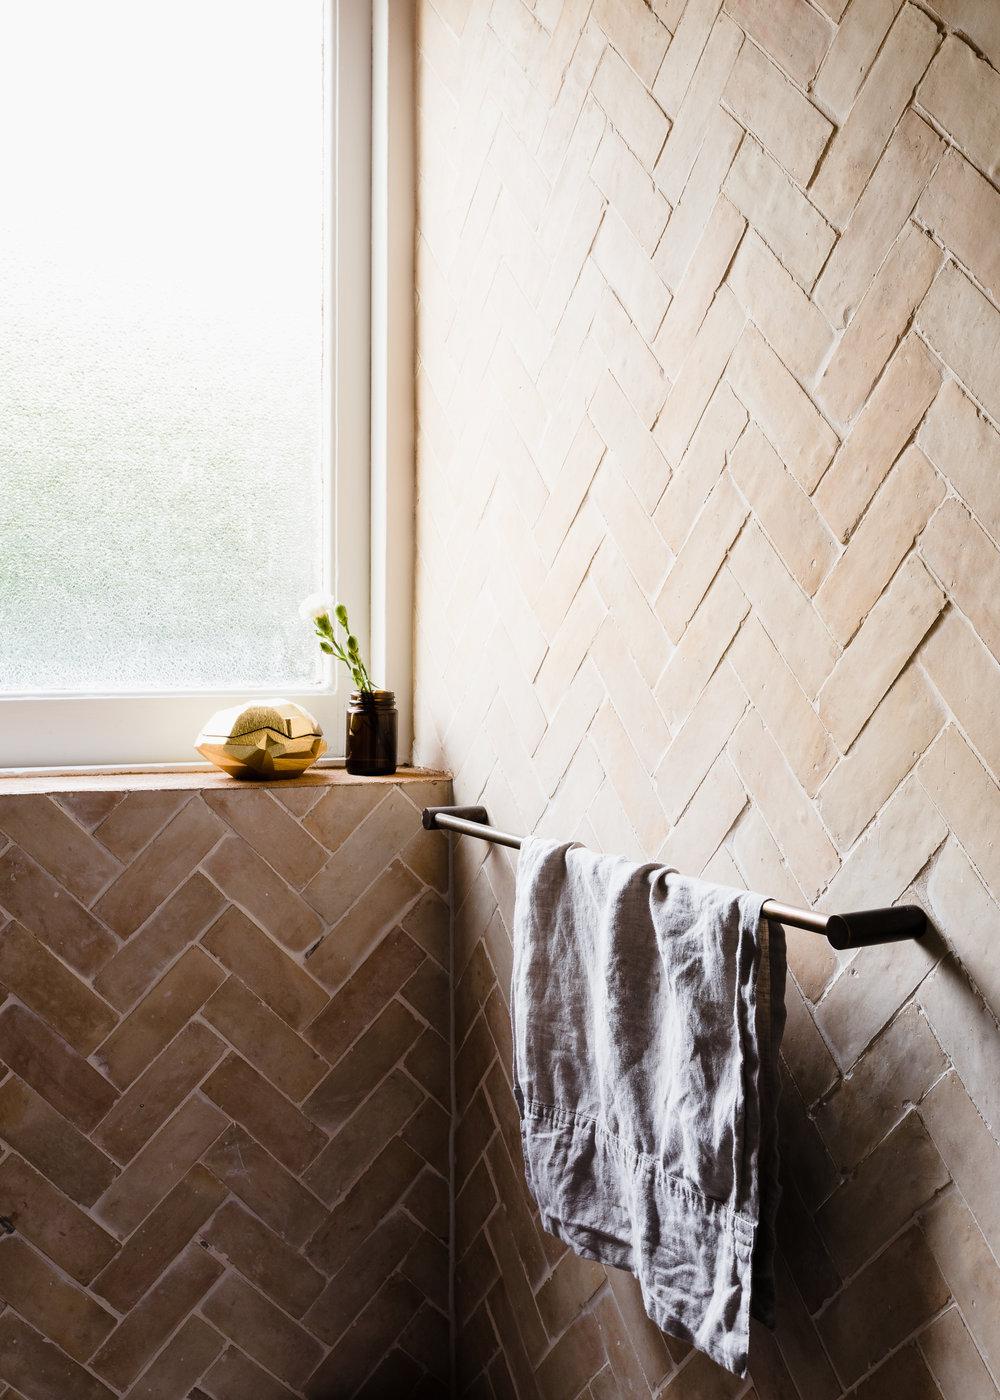 Tiles of Ezra Natural Unglazed FL005 zellige moroccan tile.jpg